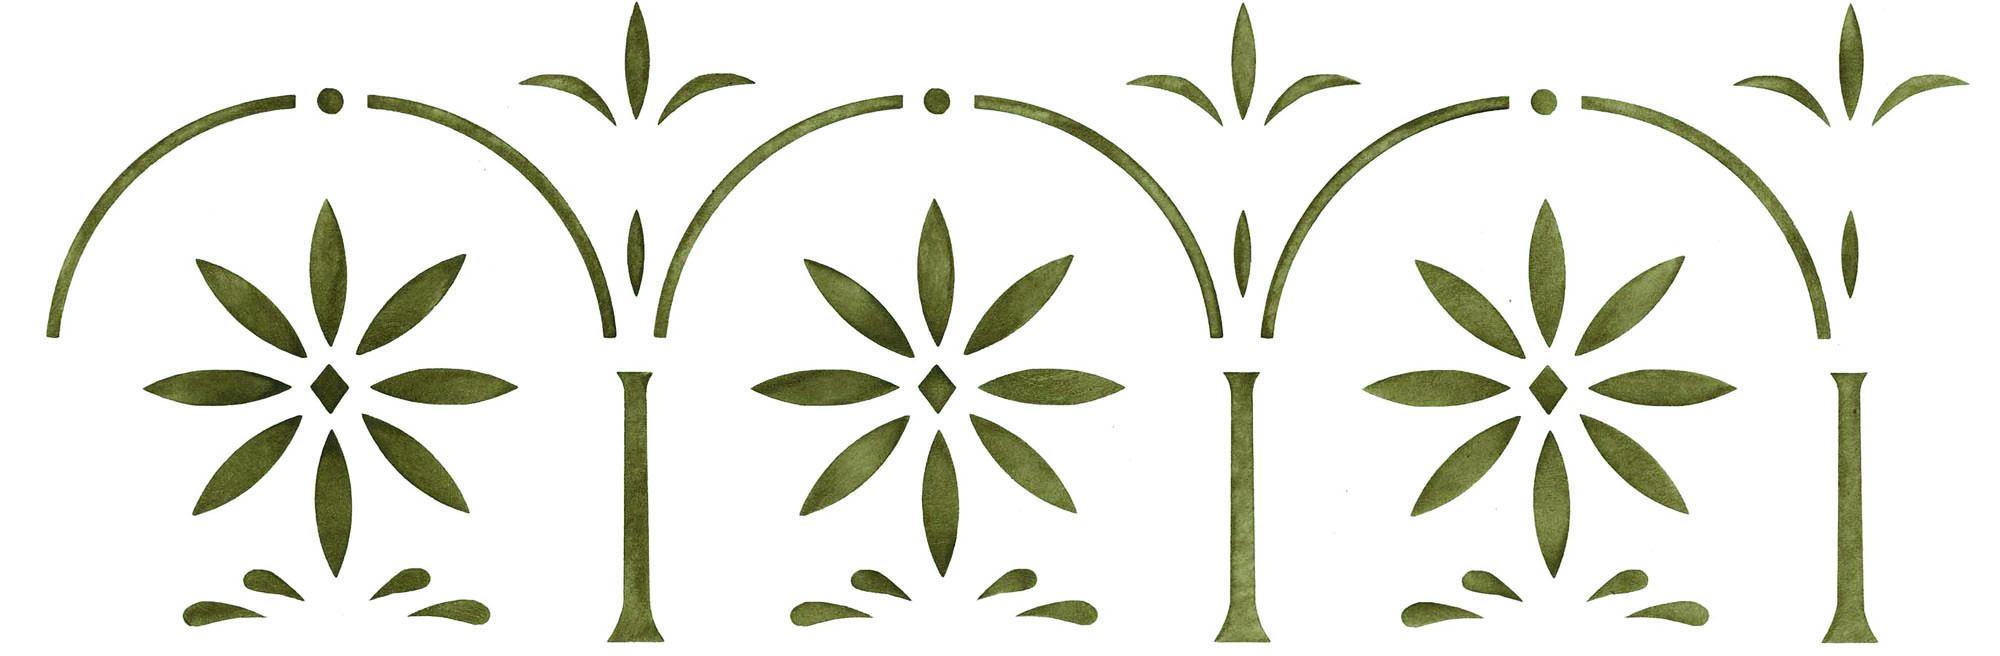 STENCIL-SB_AmHomeStencils-wheat-pattern-historical-colonial-stencil_gn